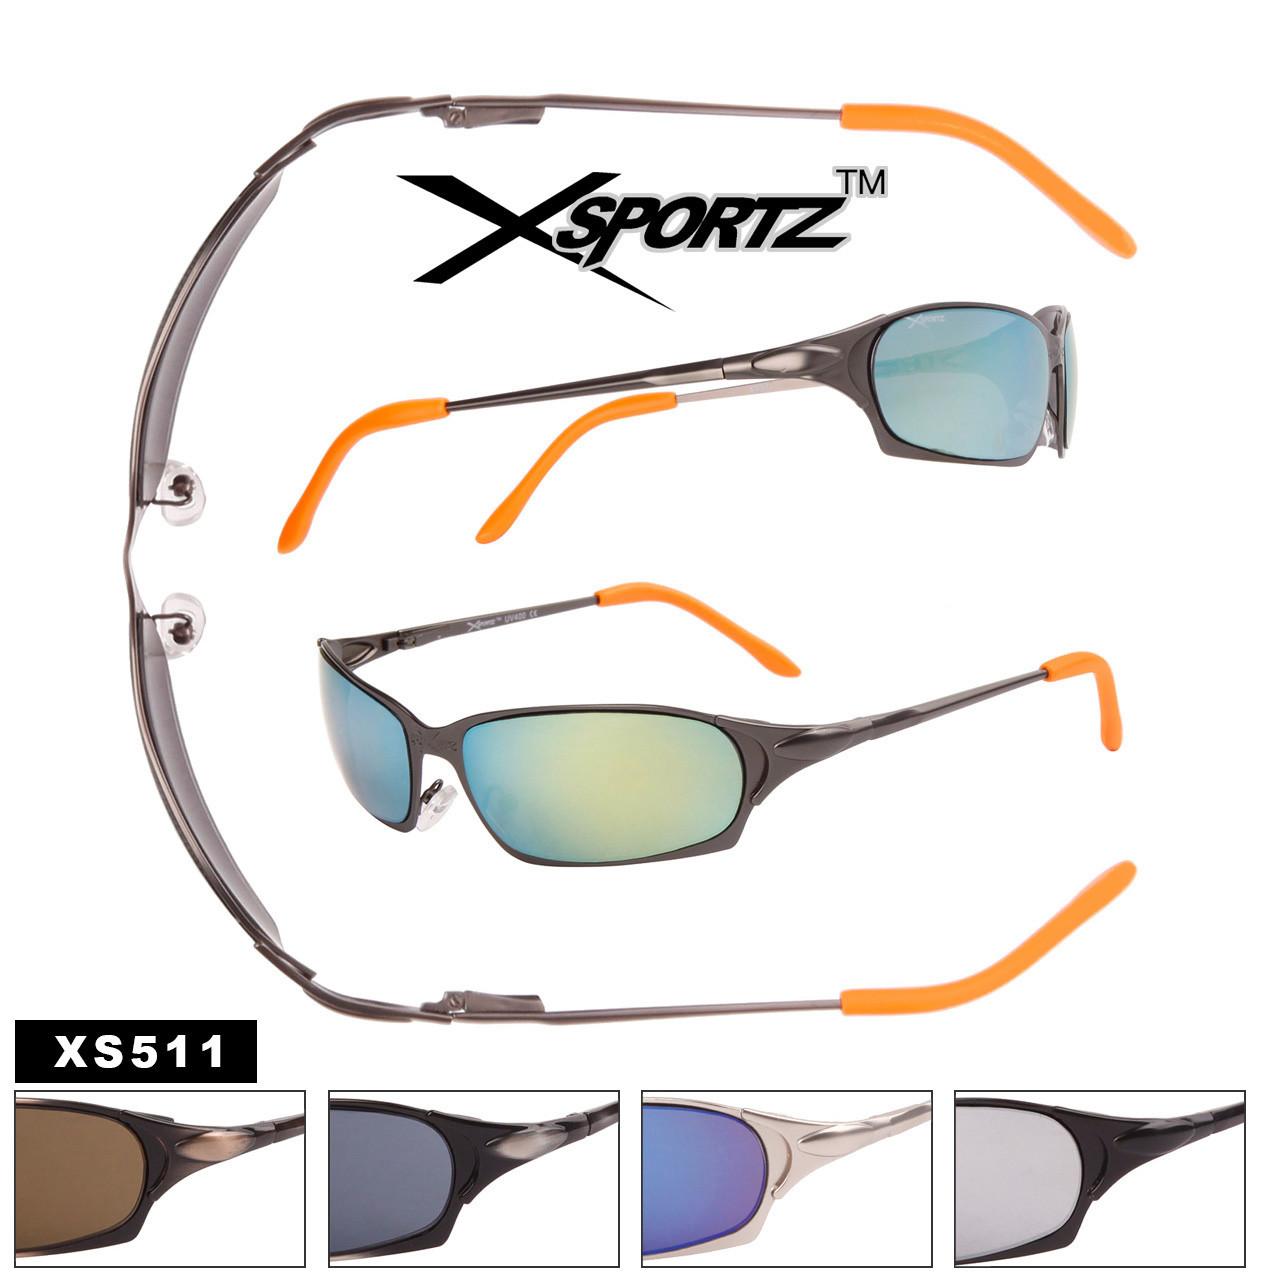 Wrap Around Metal Xsportz™ Spring Hinge Sport Sunglasses - Style #XS511